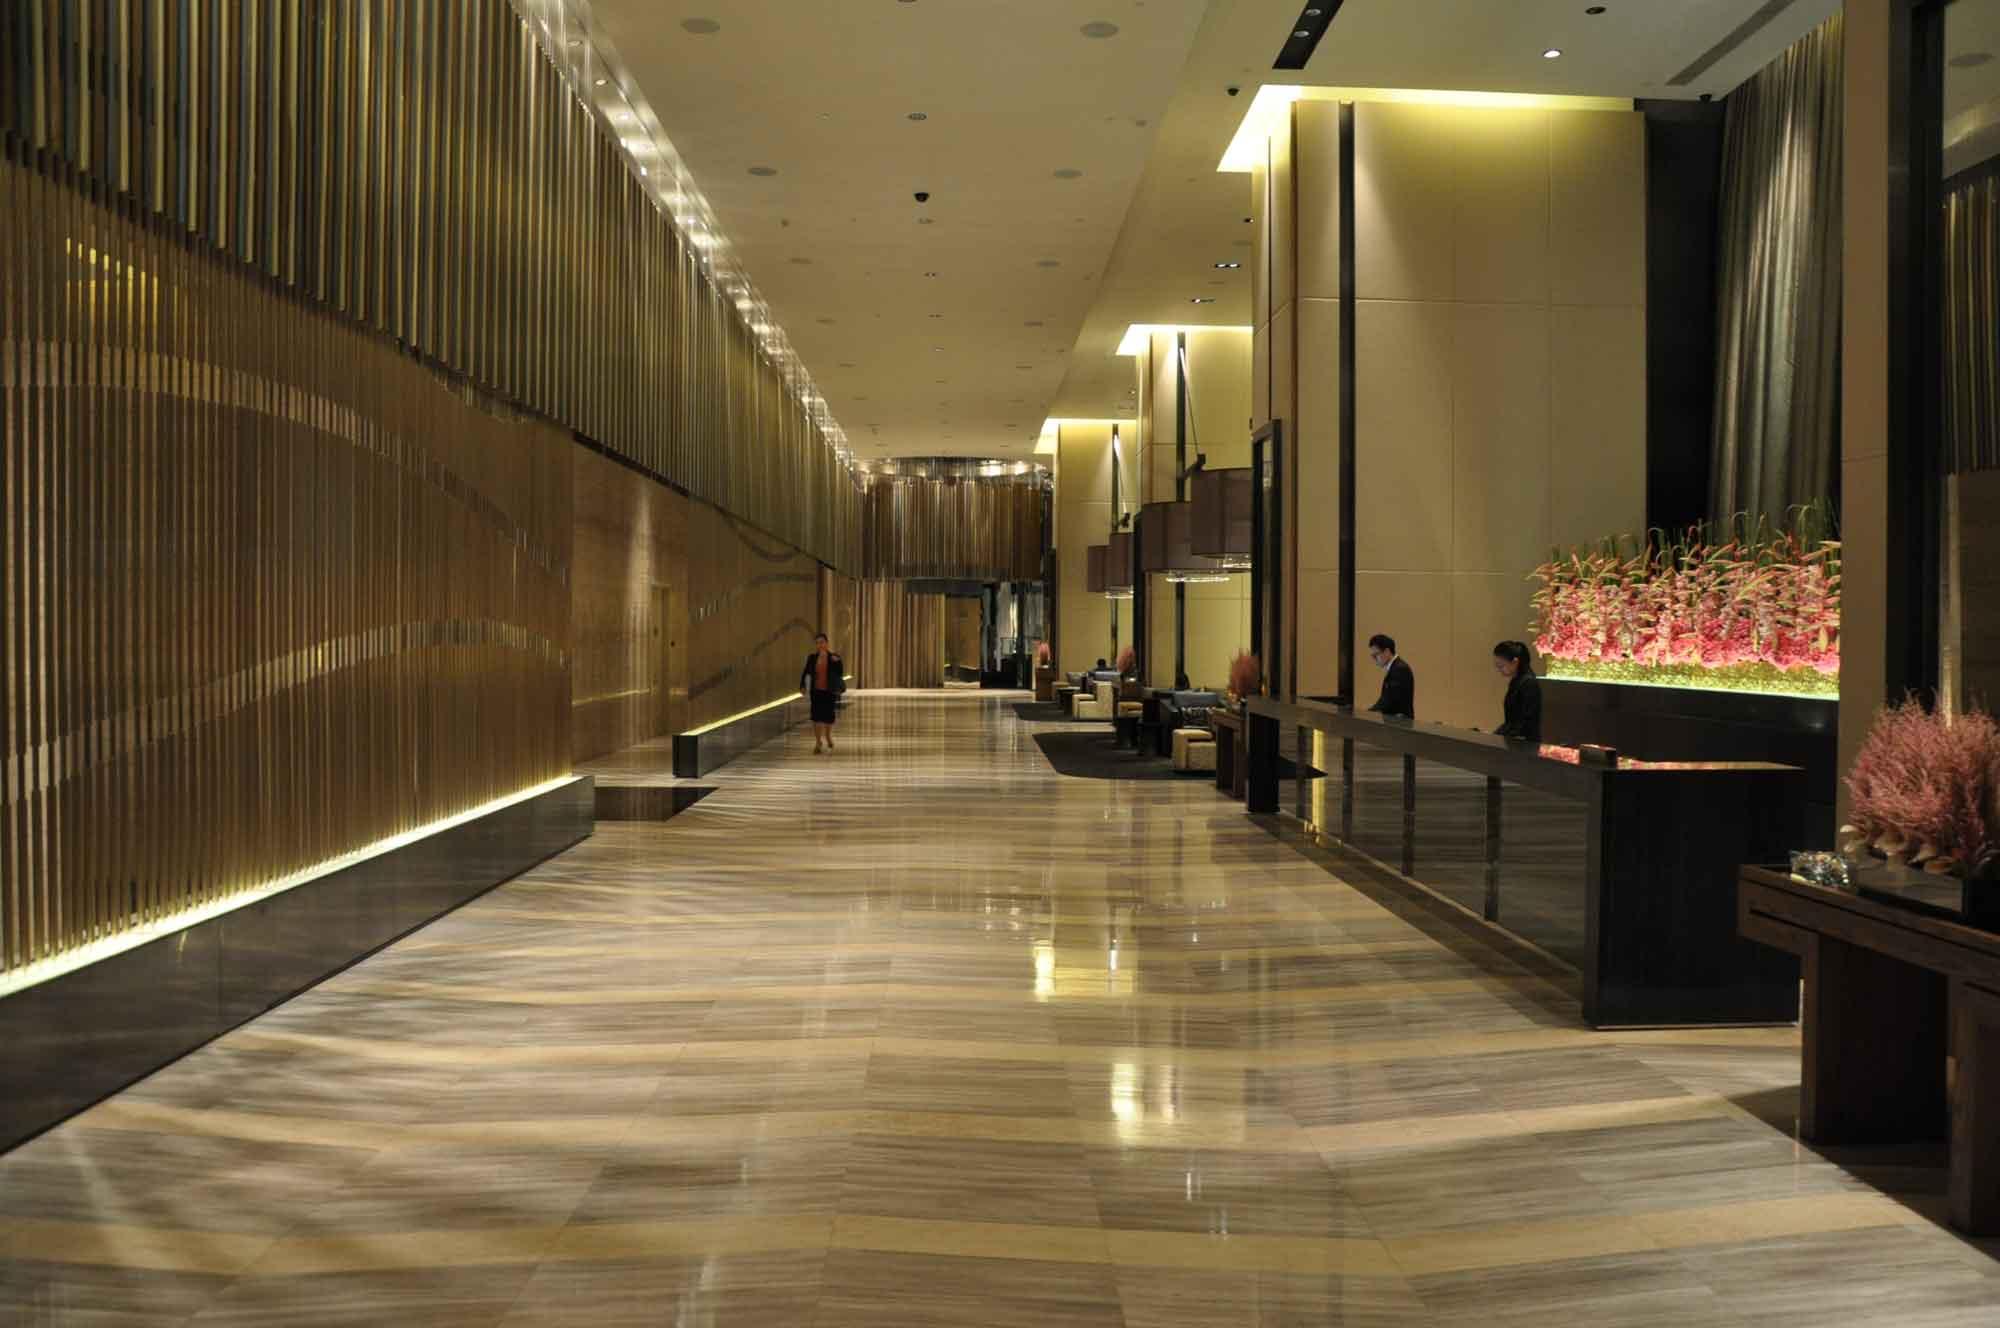 Nuwa Hotel lobby